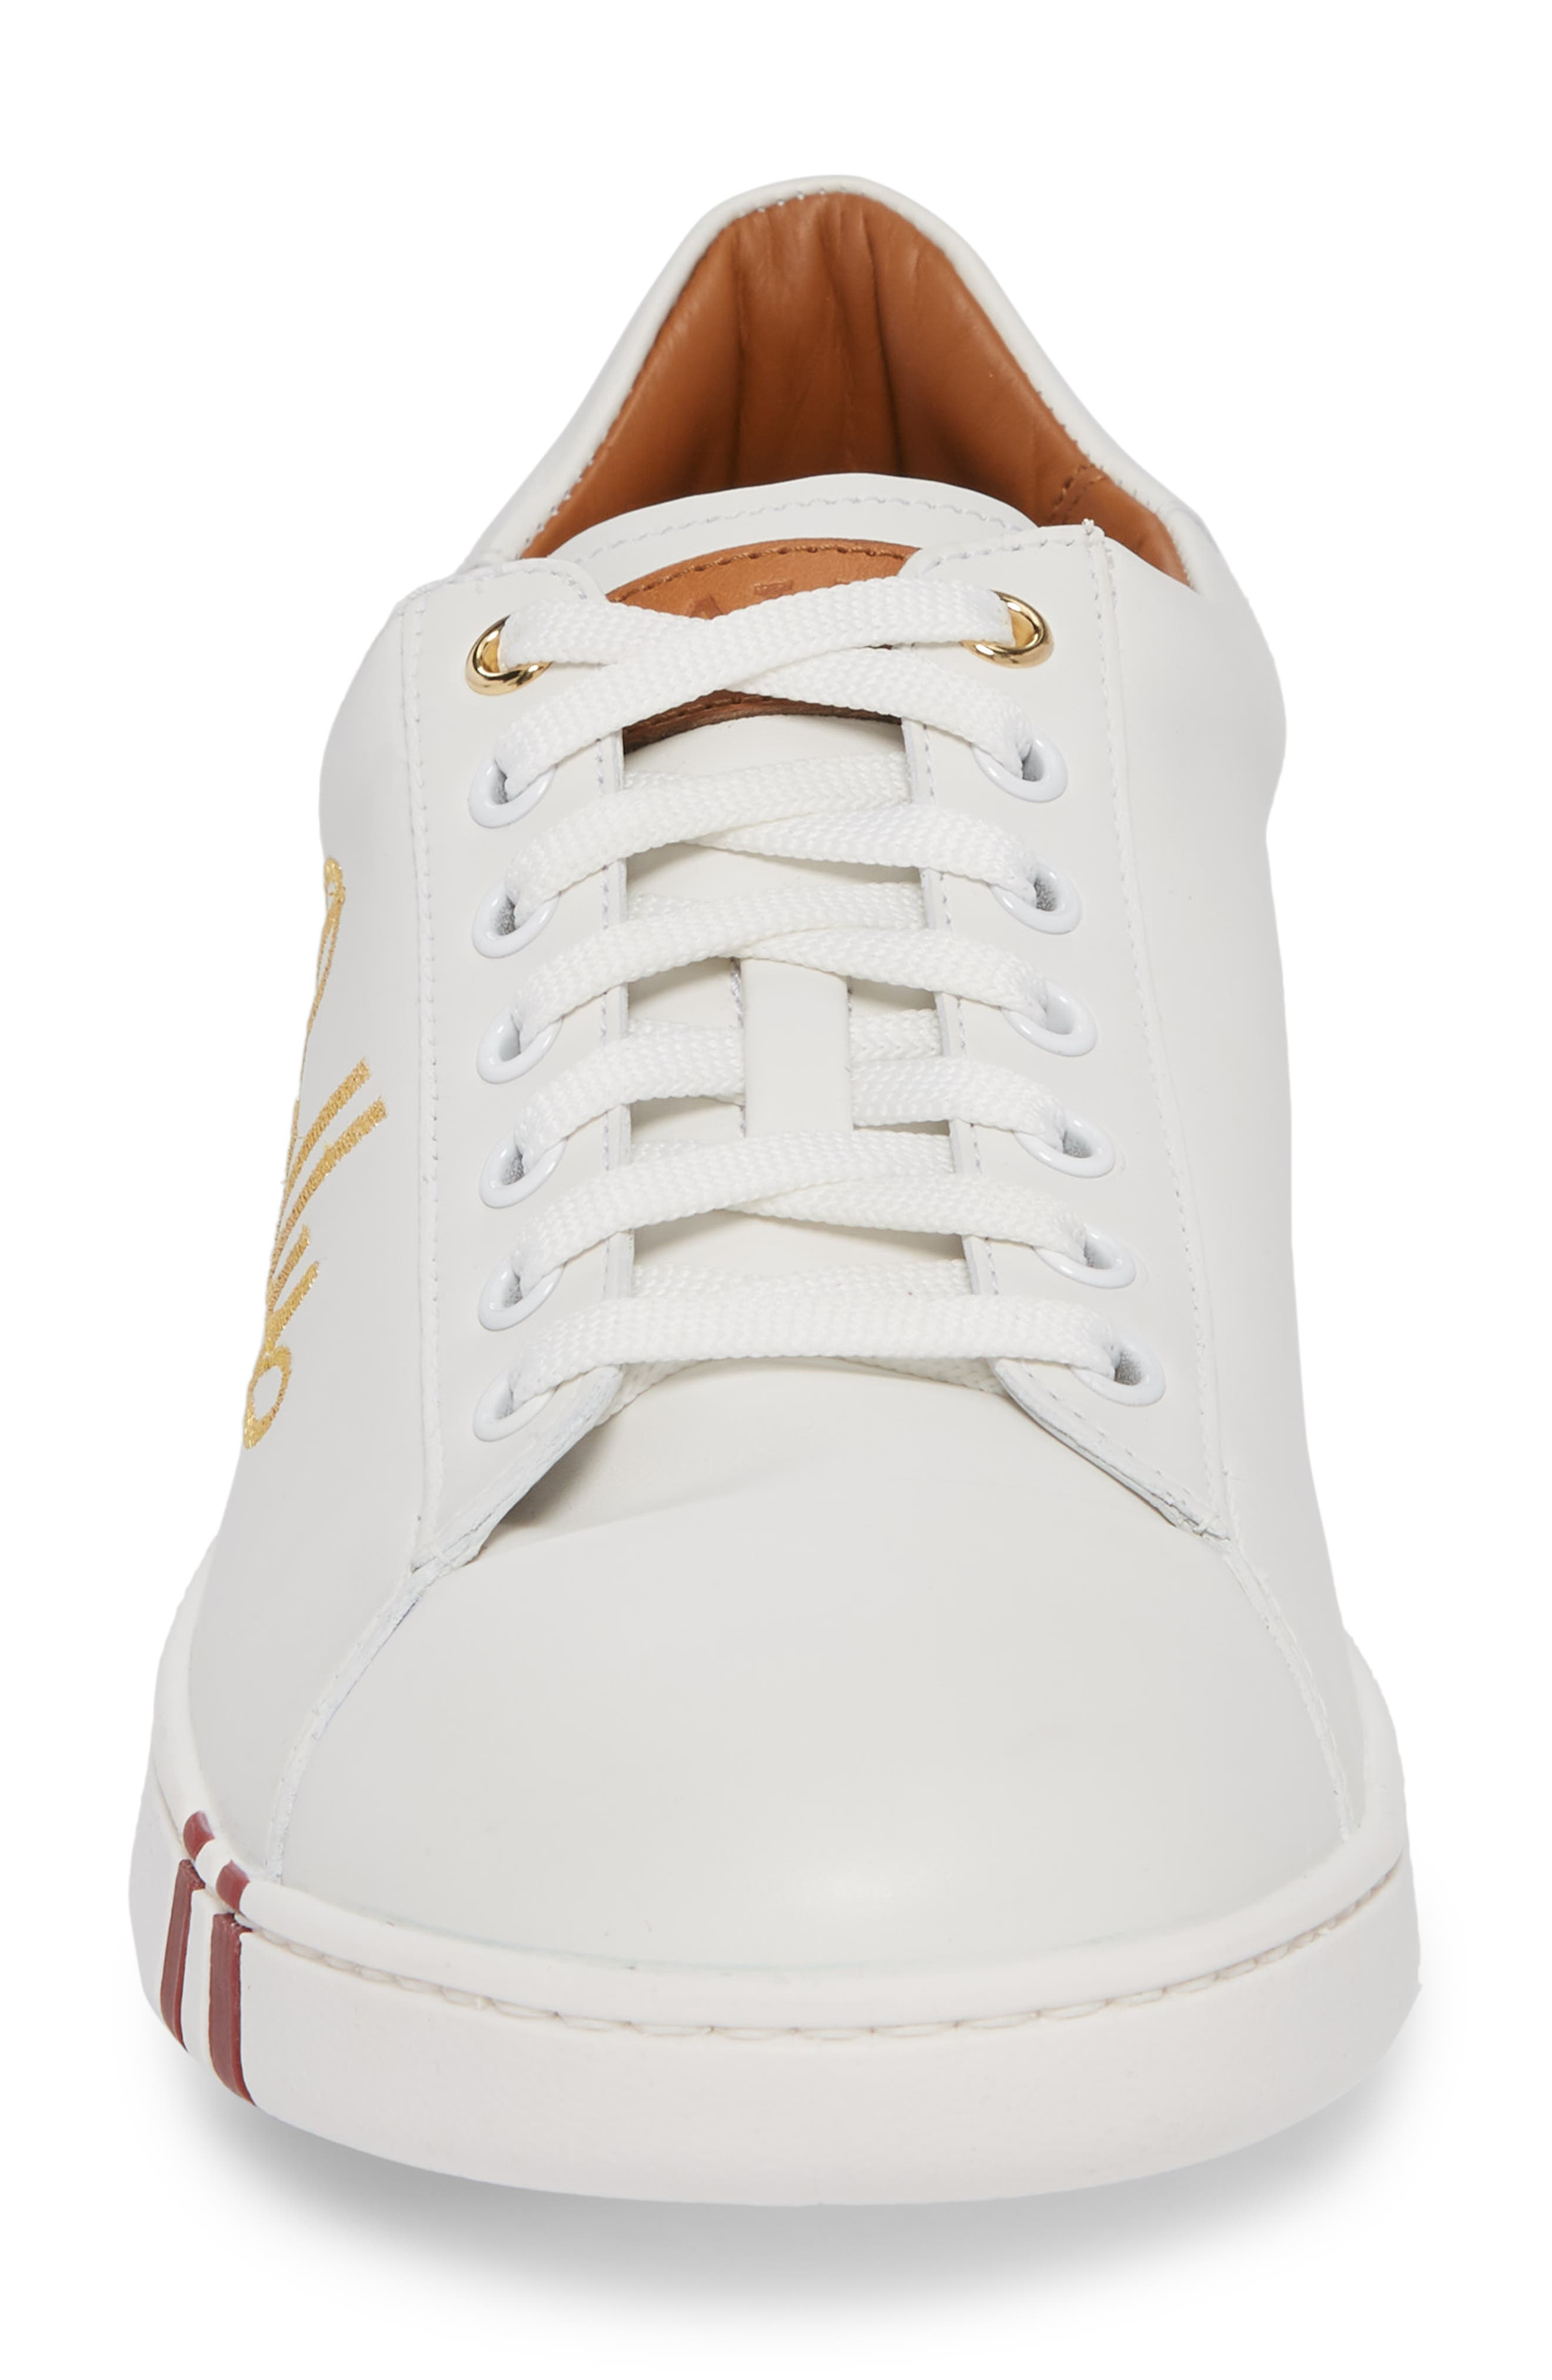 Winston Low Top Sneaker,                             Alternate thumbnail 4, color,                             WHITE